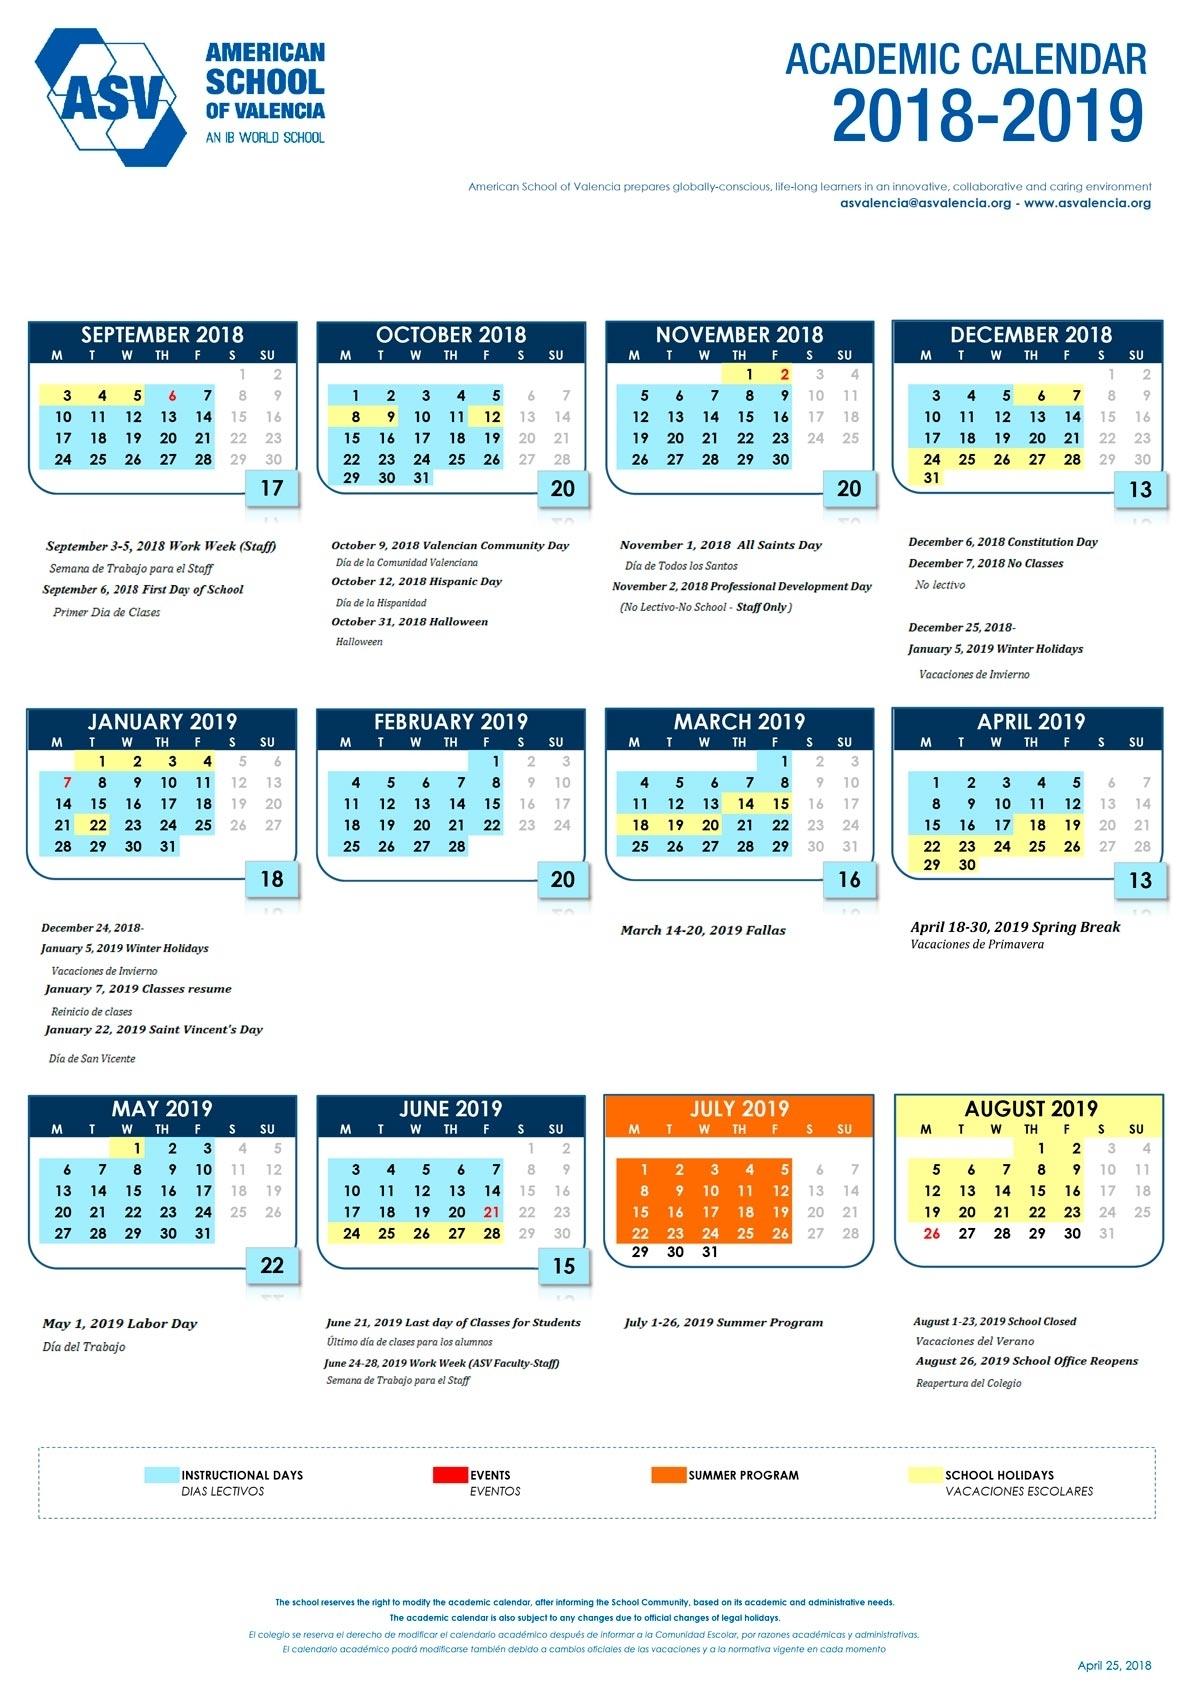 Nus 2019/2020 Academic Calendar - Calendar Inspiration Design